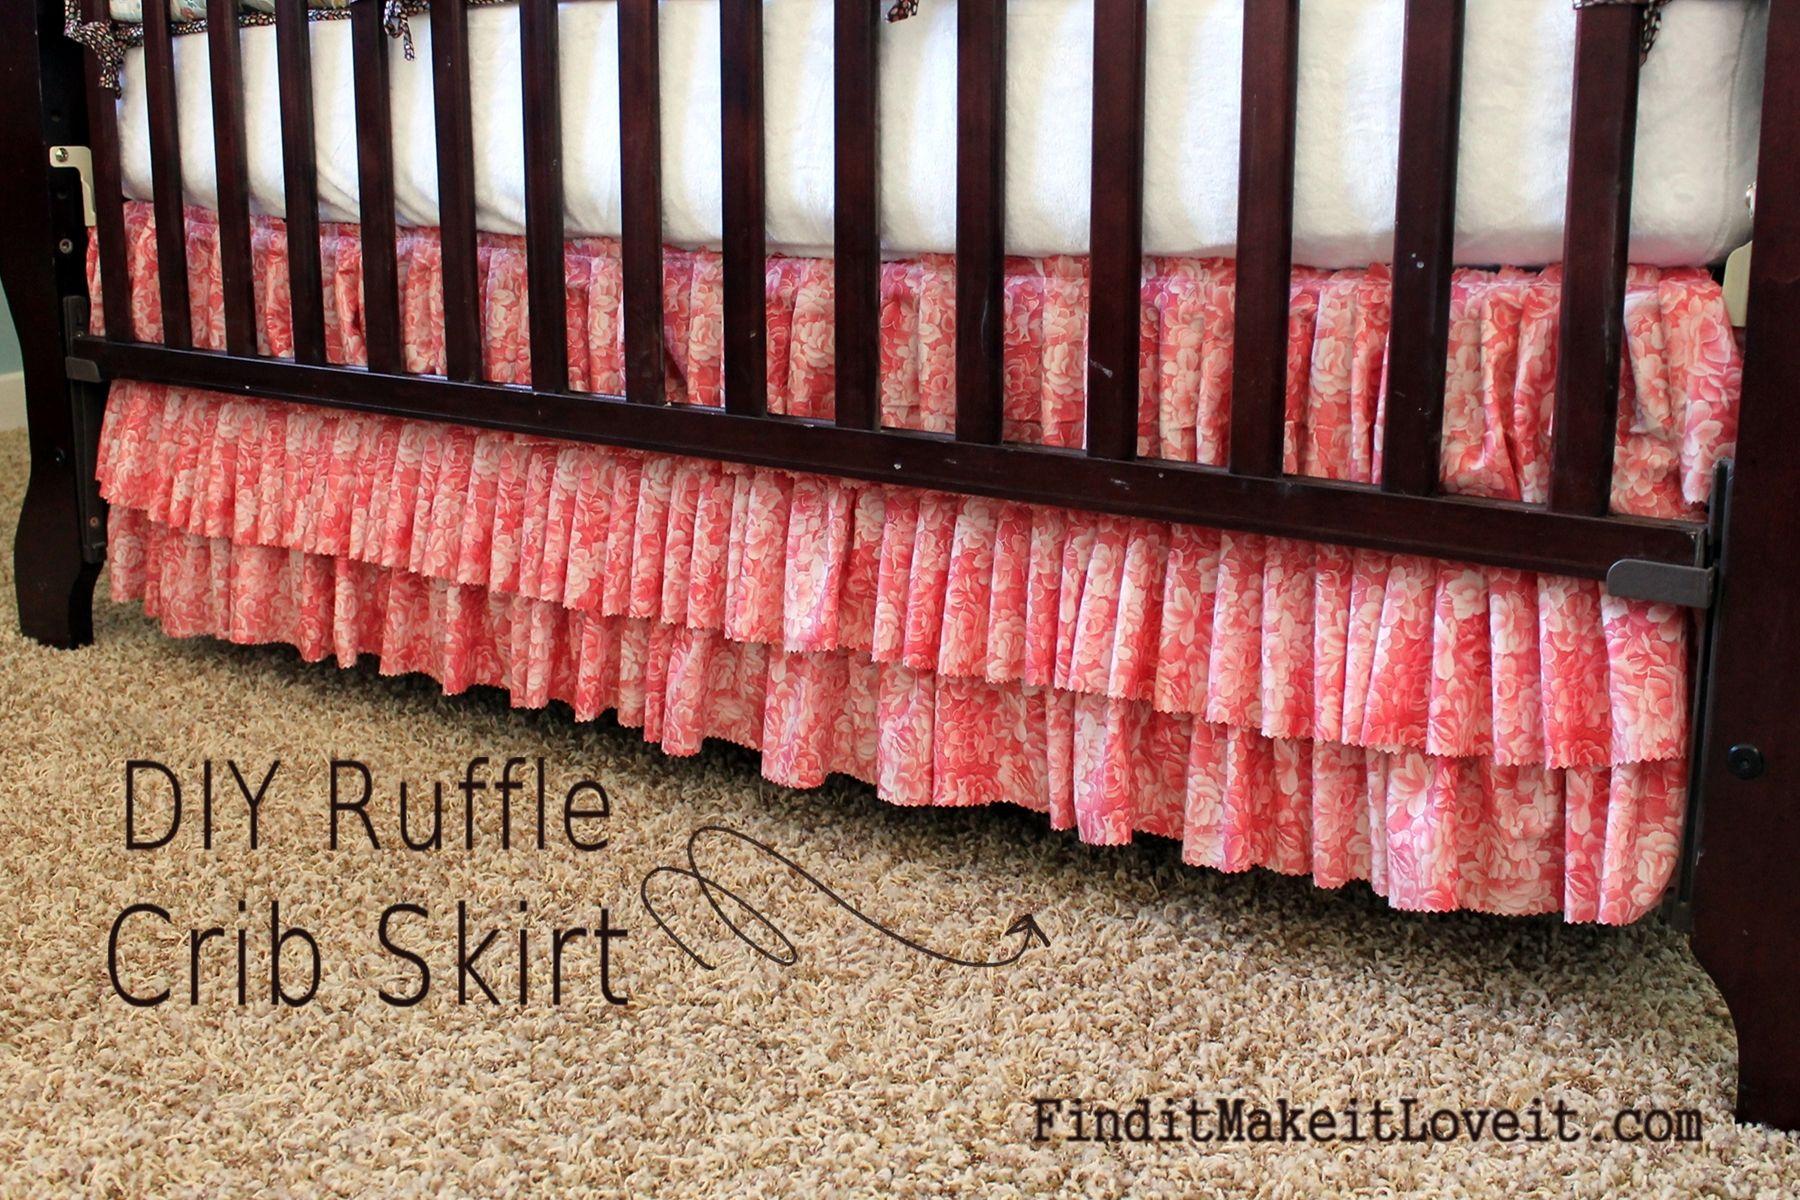 Diy Ruffle Crib Skirt Mary Sophia Cribs Crib Skirts